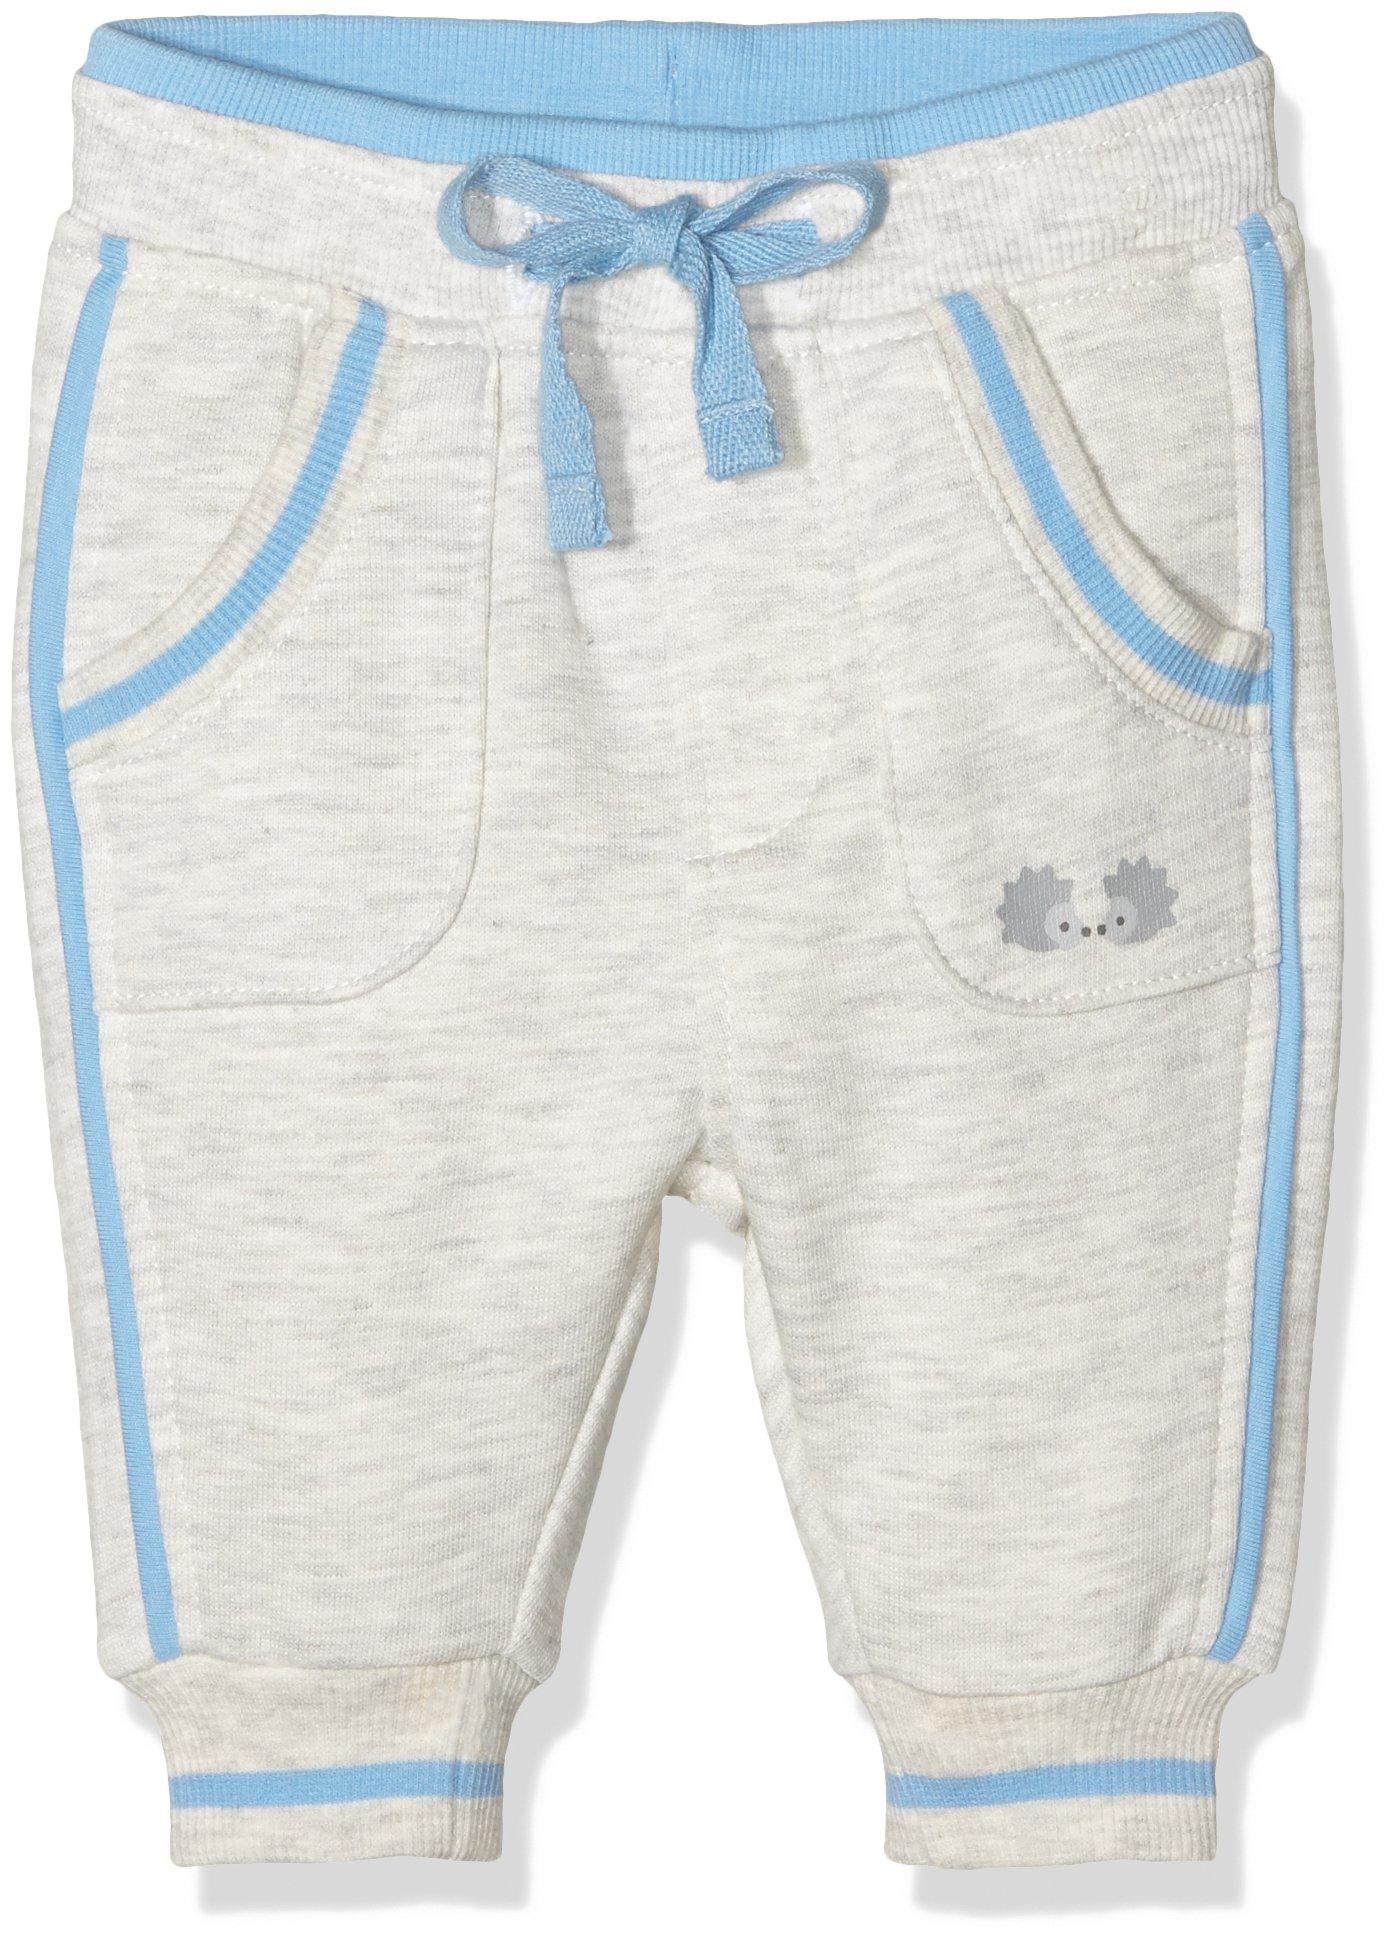 Twins 121125 - Pantalones Deportivos Bebé-Niños product image